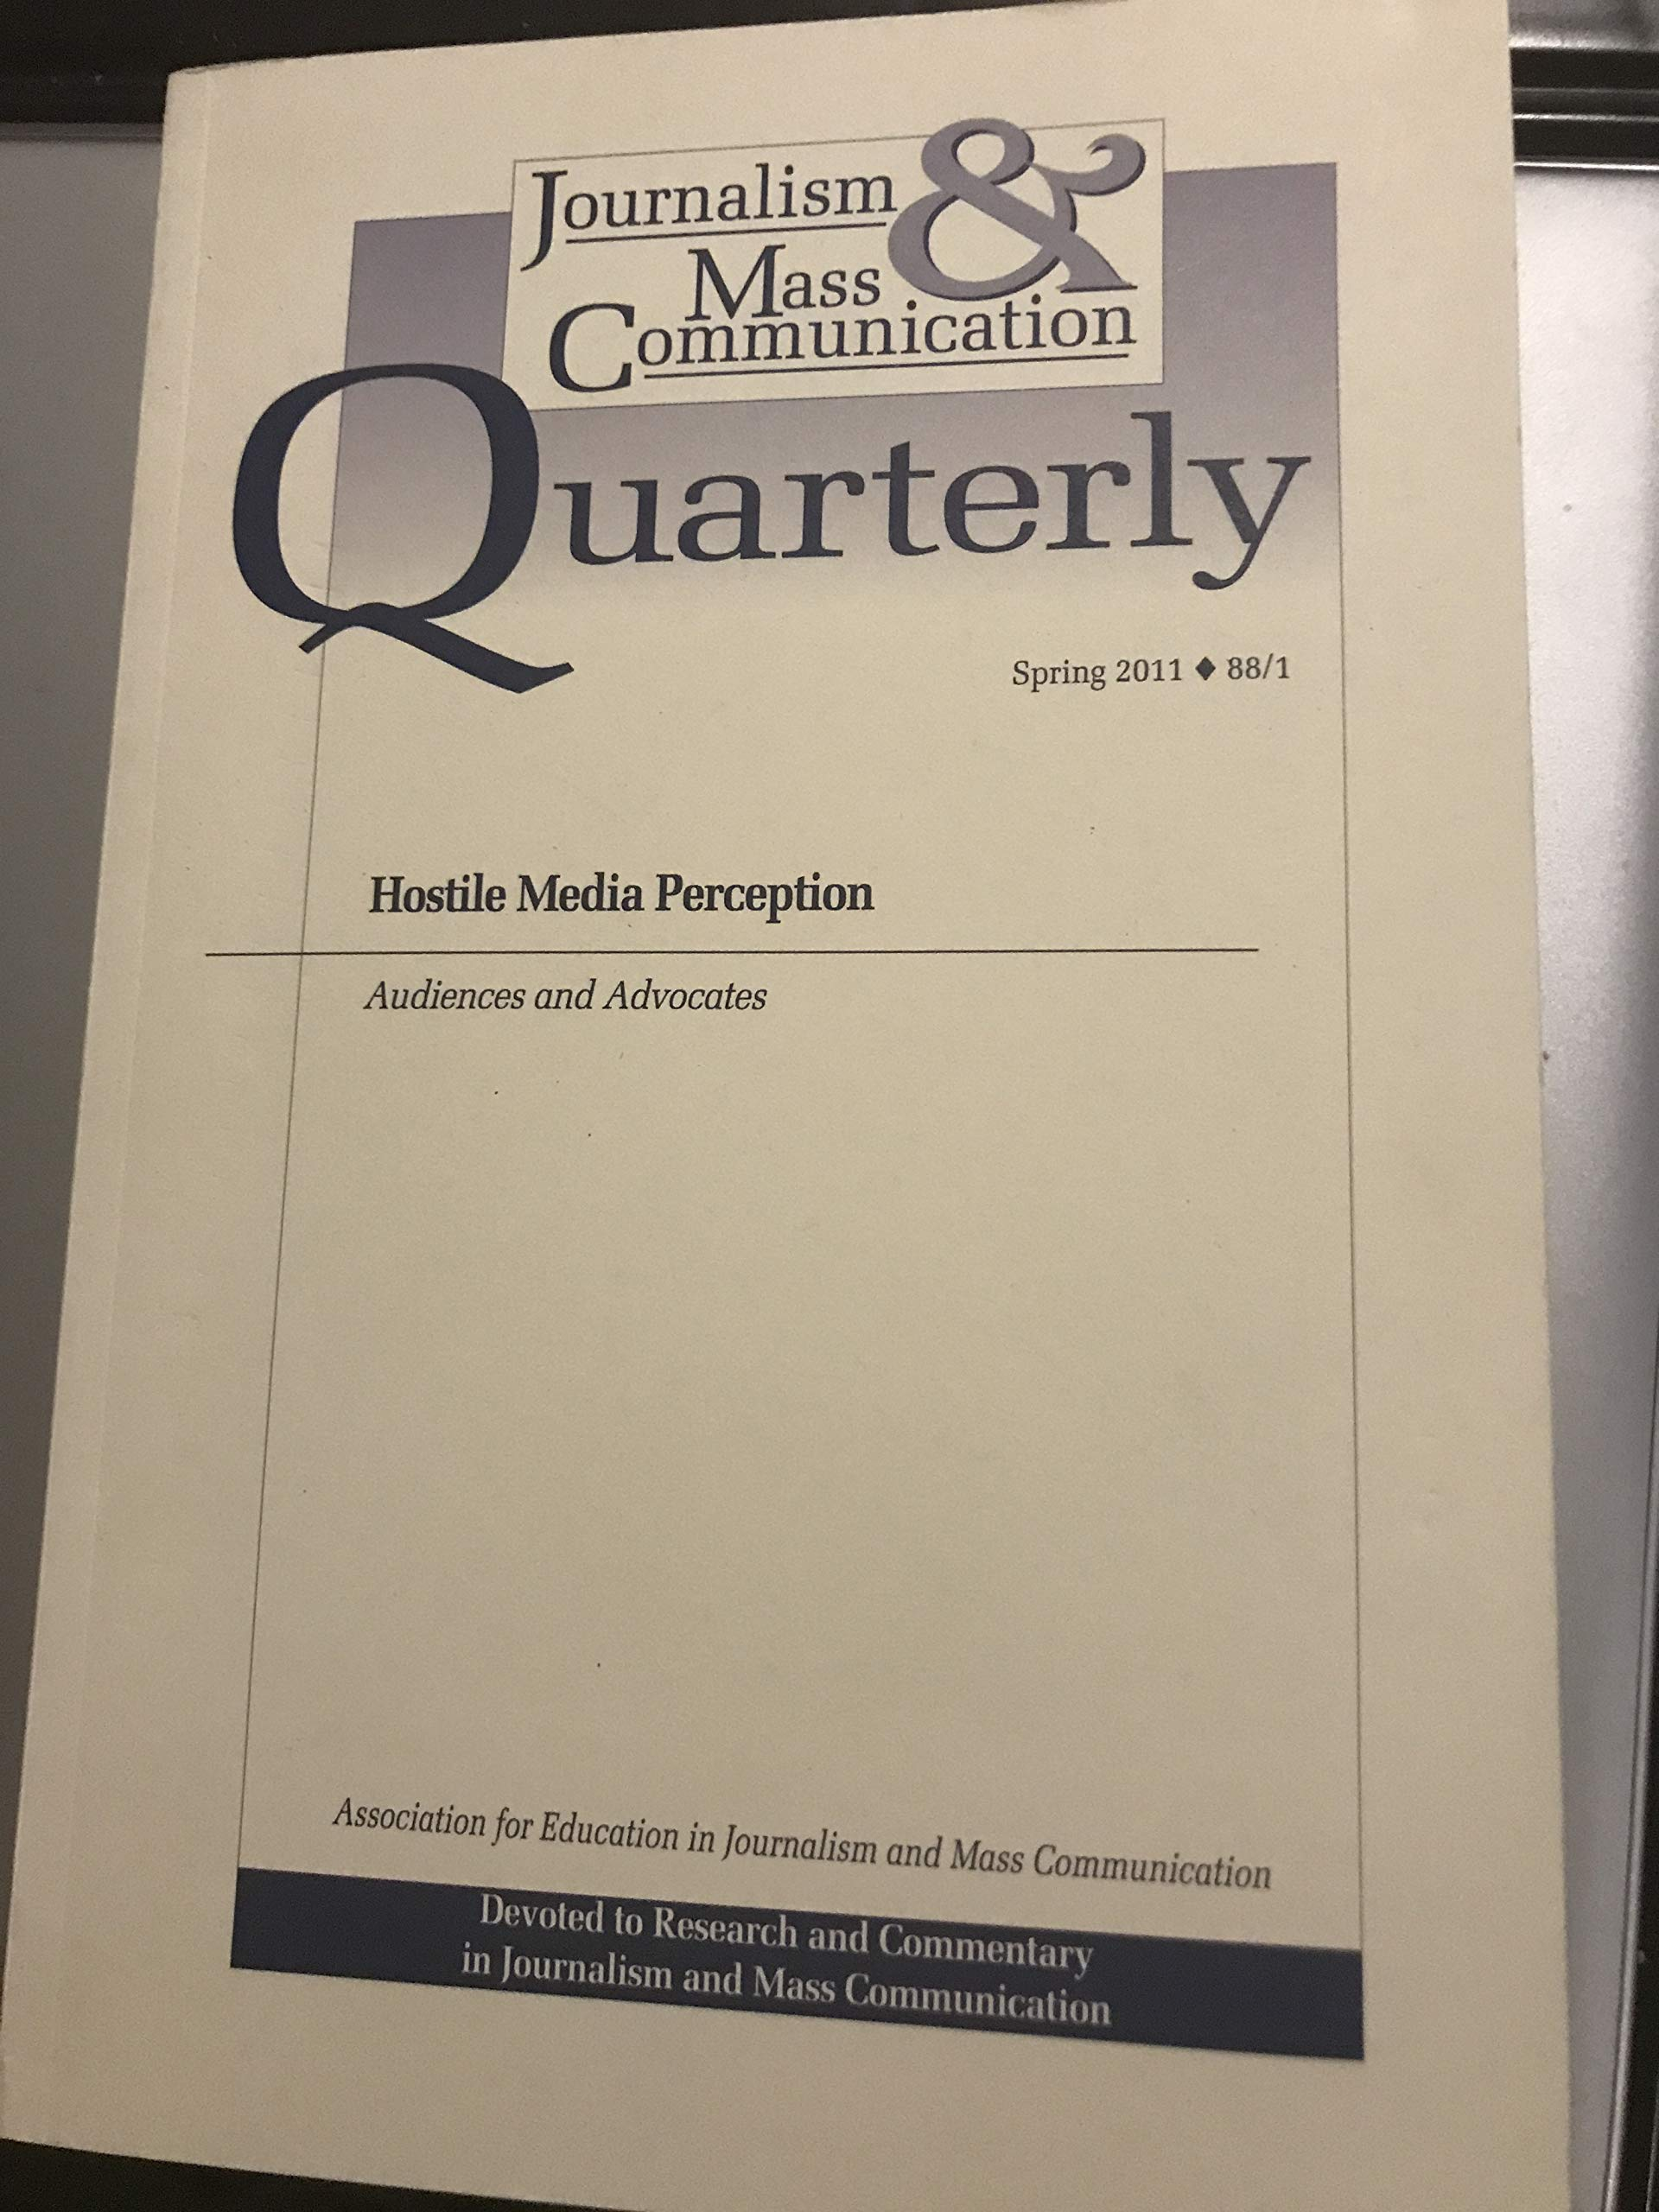 Journalism and Mass Communication Quarterly, Spring 2011 ...